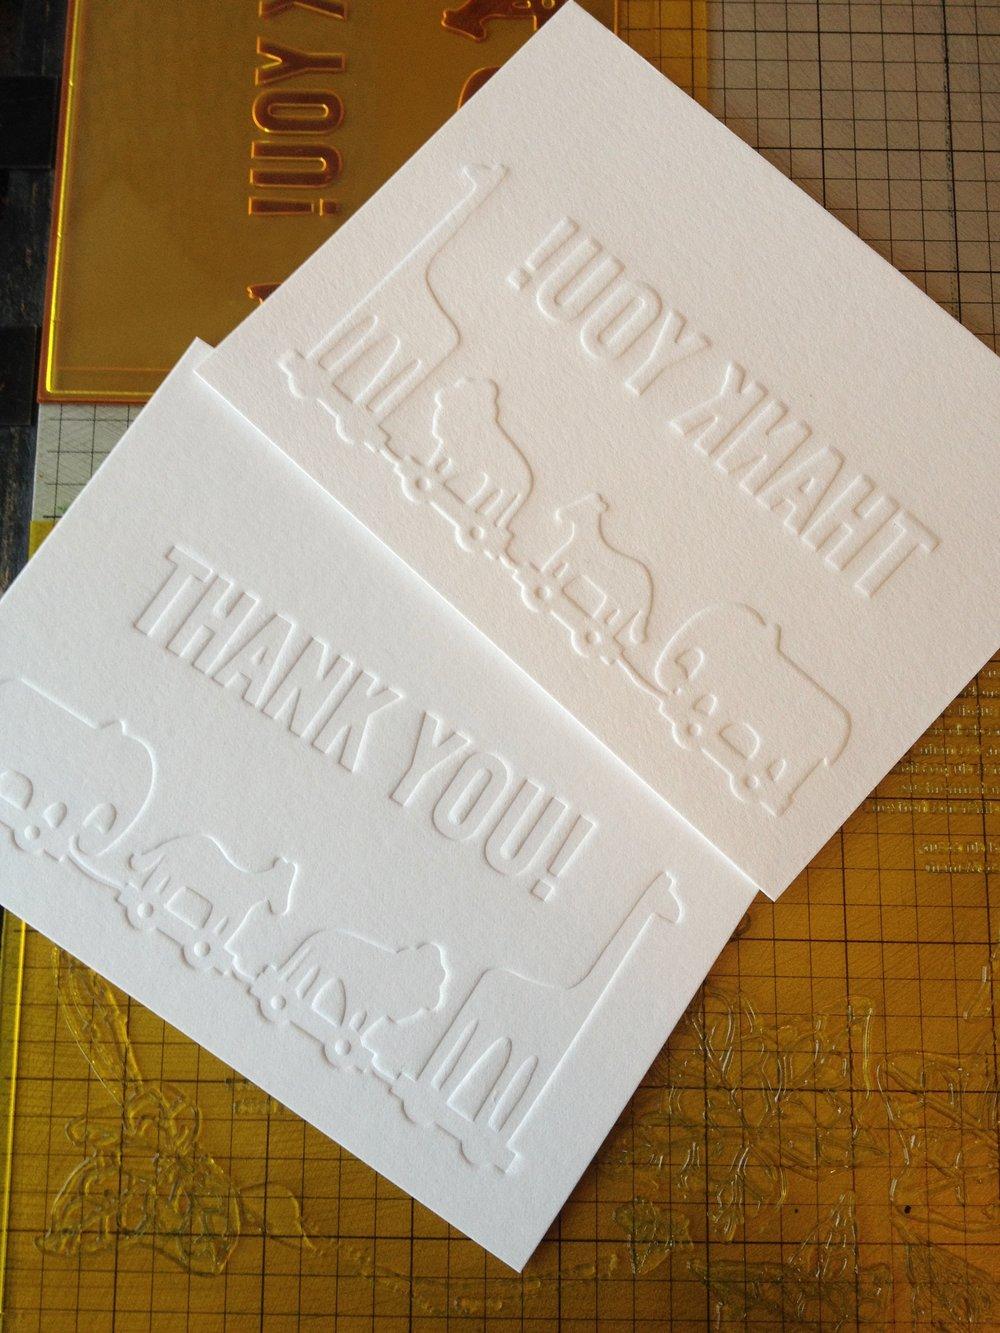 thankyou_emboss_letterpress_passepartout.jpg